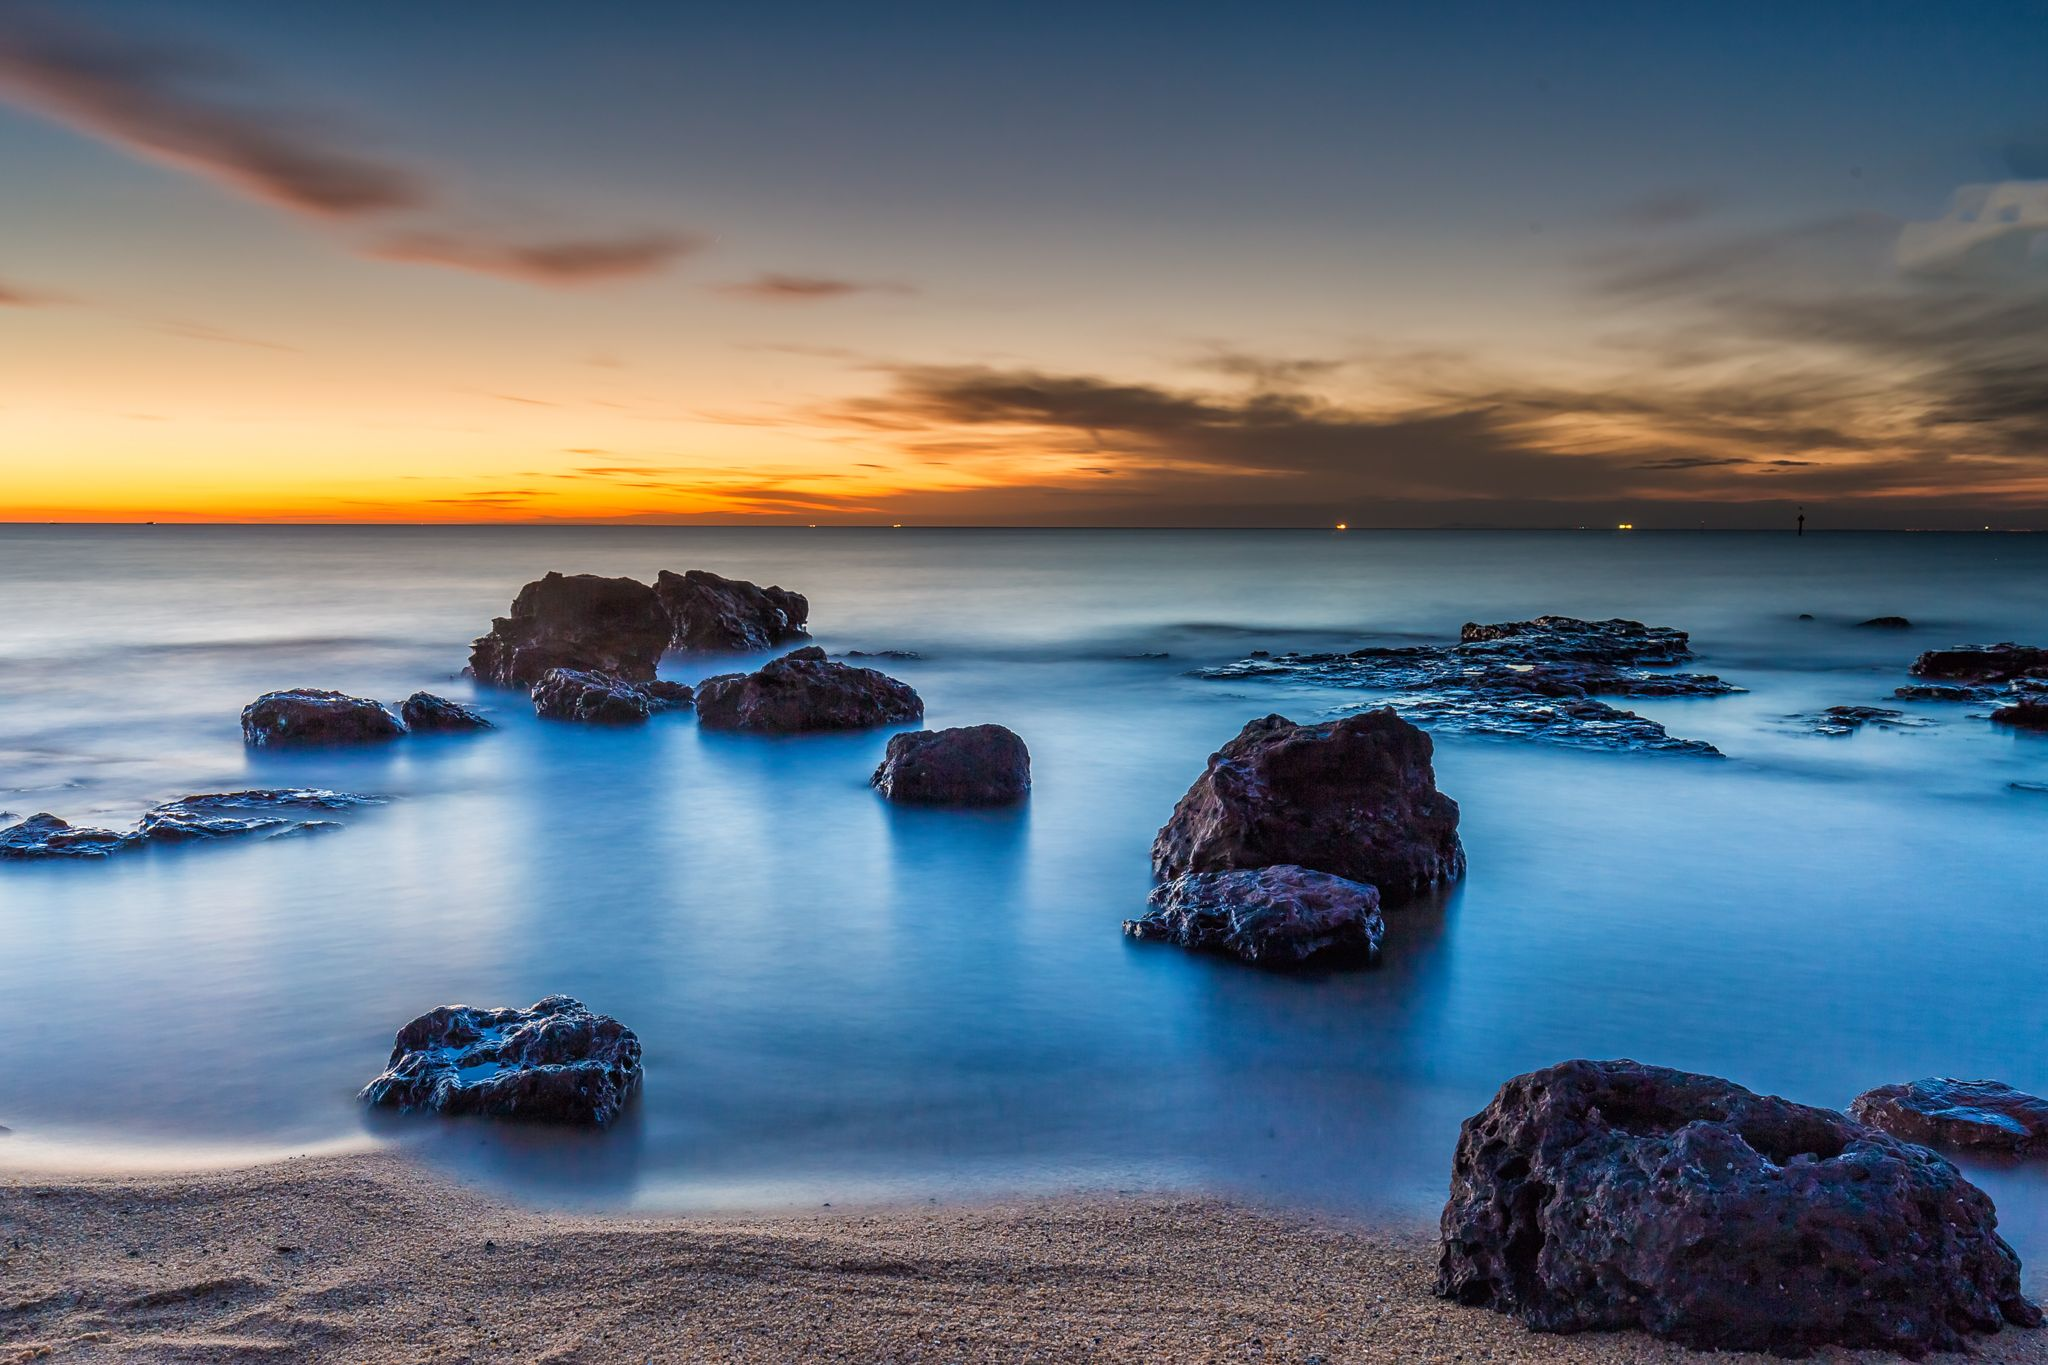 Sunset Black Rock Beach Melbourne Seascape Photography Sunrise Sunset Landscape